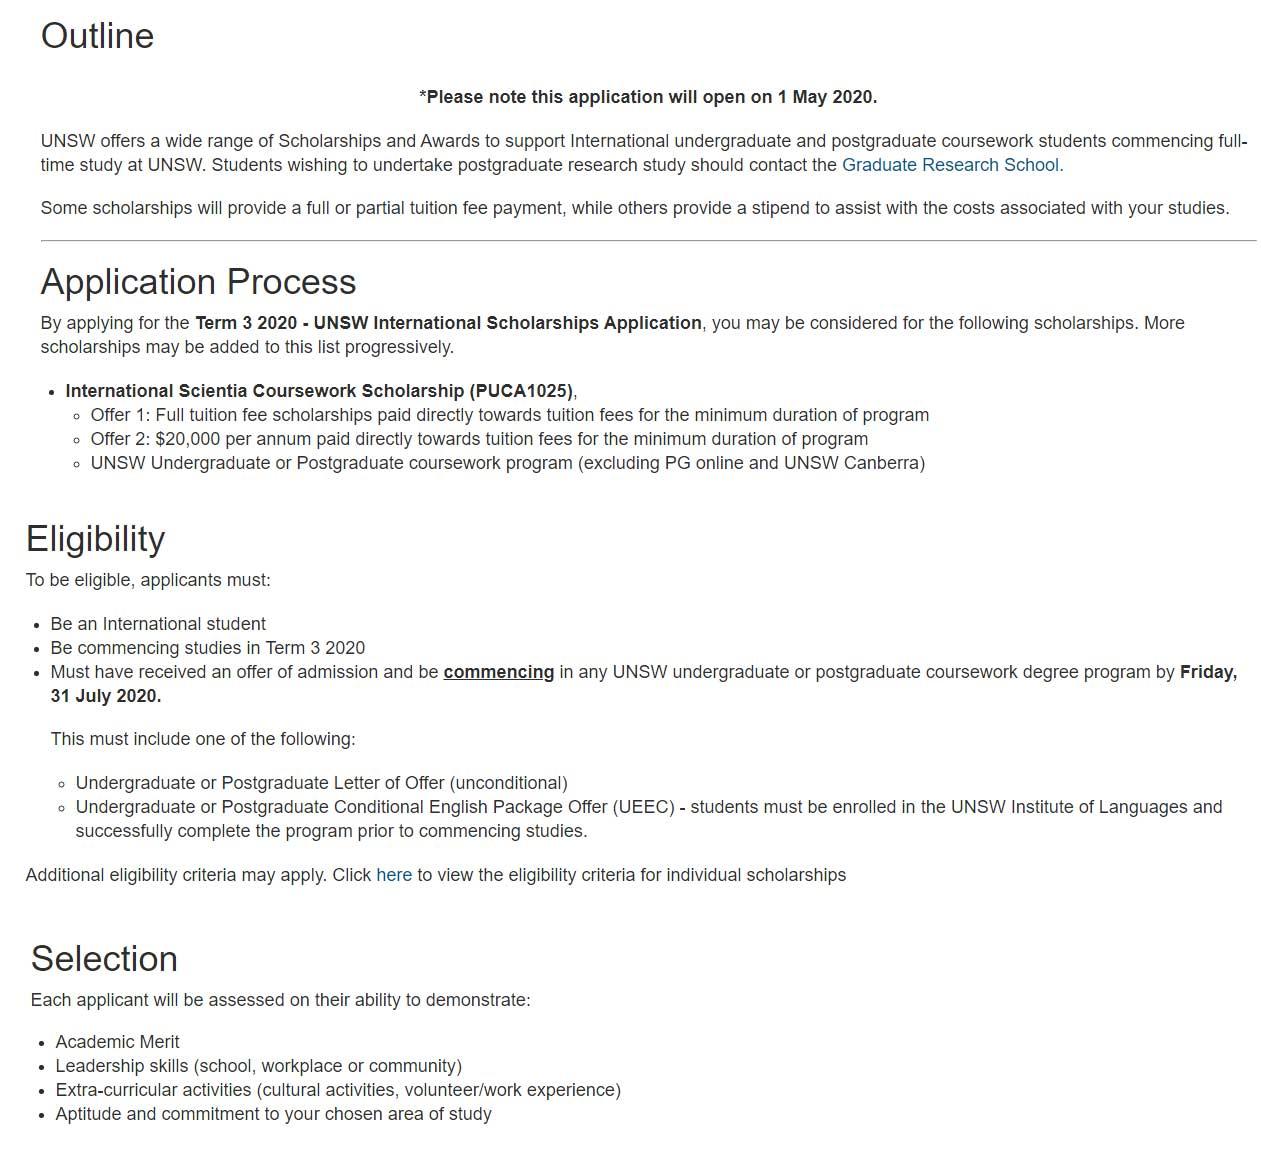 https://ishallwin.com/Content/ScholarshipImages/University-of-New-South-Wales-International-Scholarships.jpg